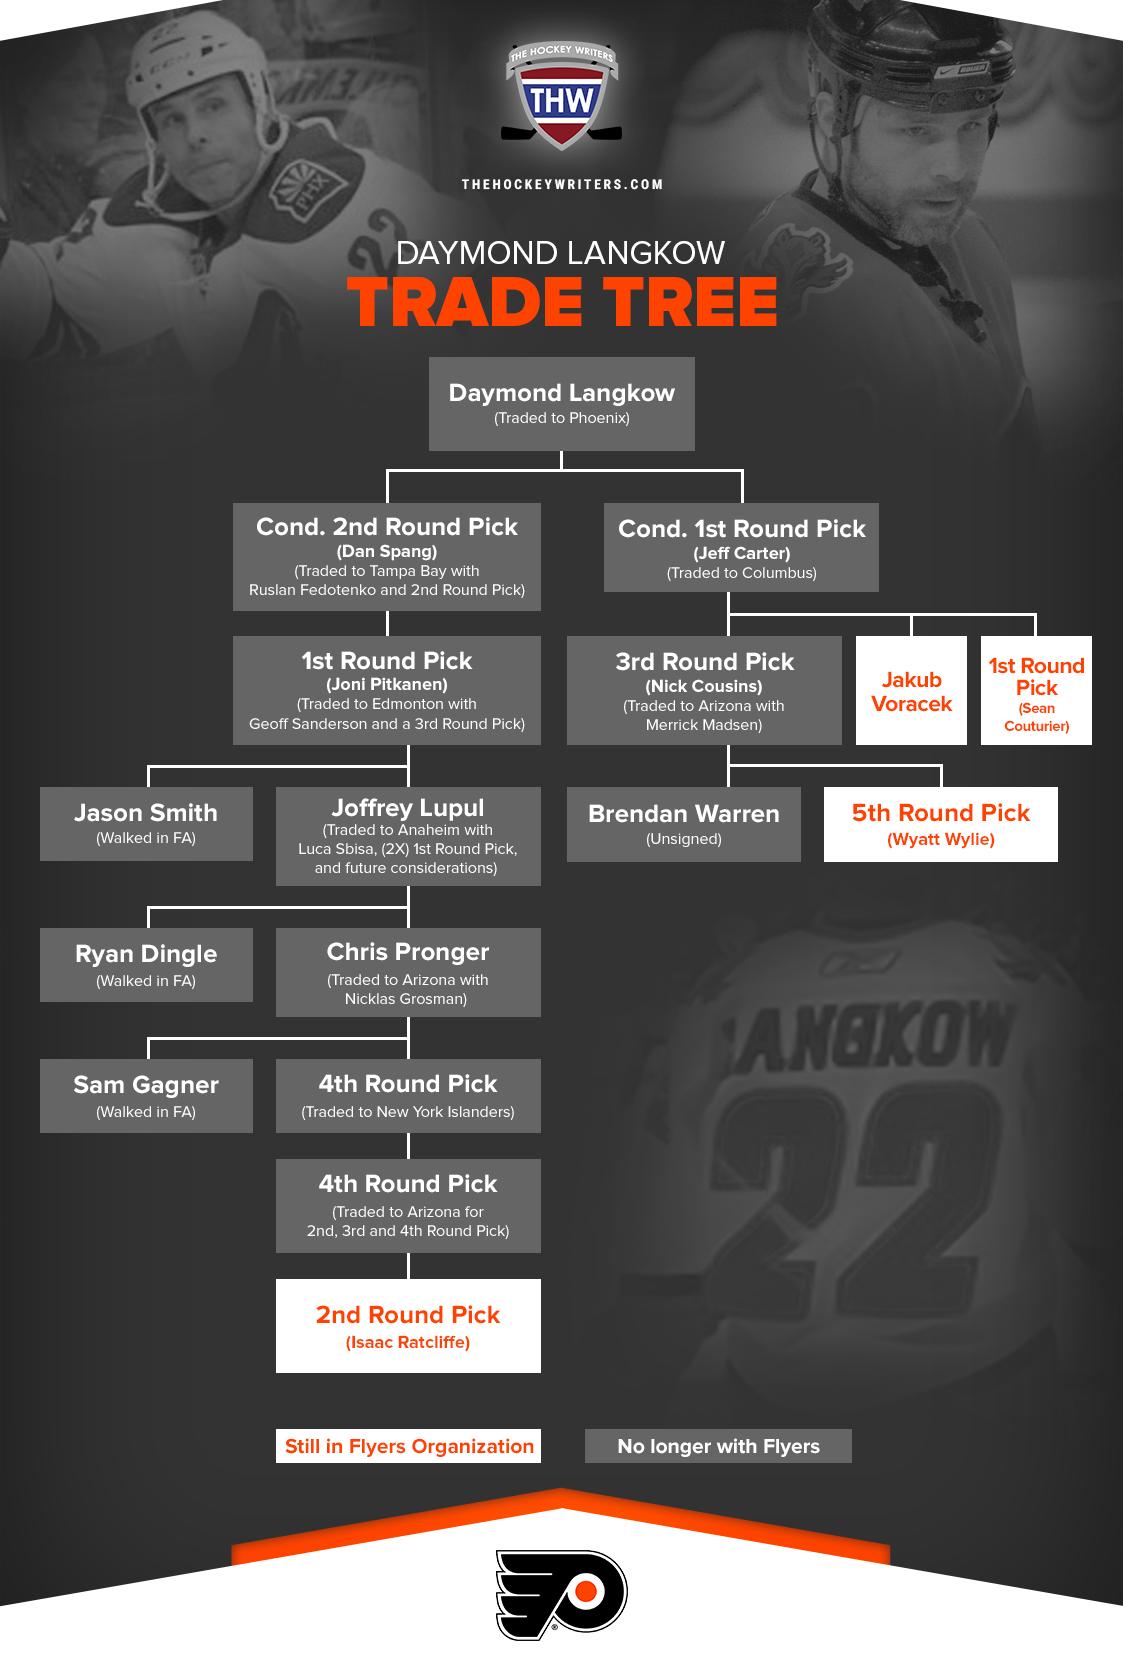 Daymond Langkow Trade Tree Philadelphia Flyers